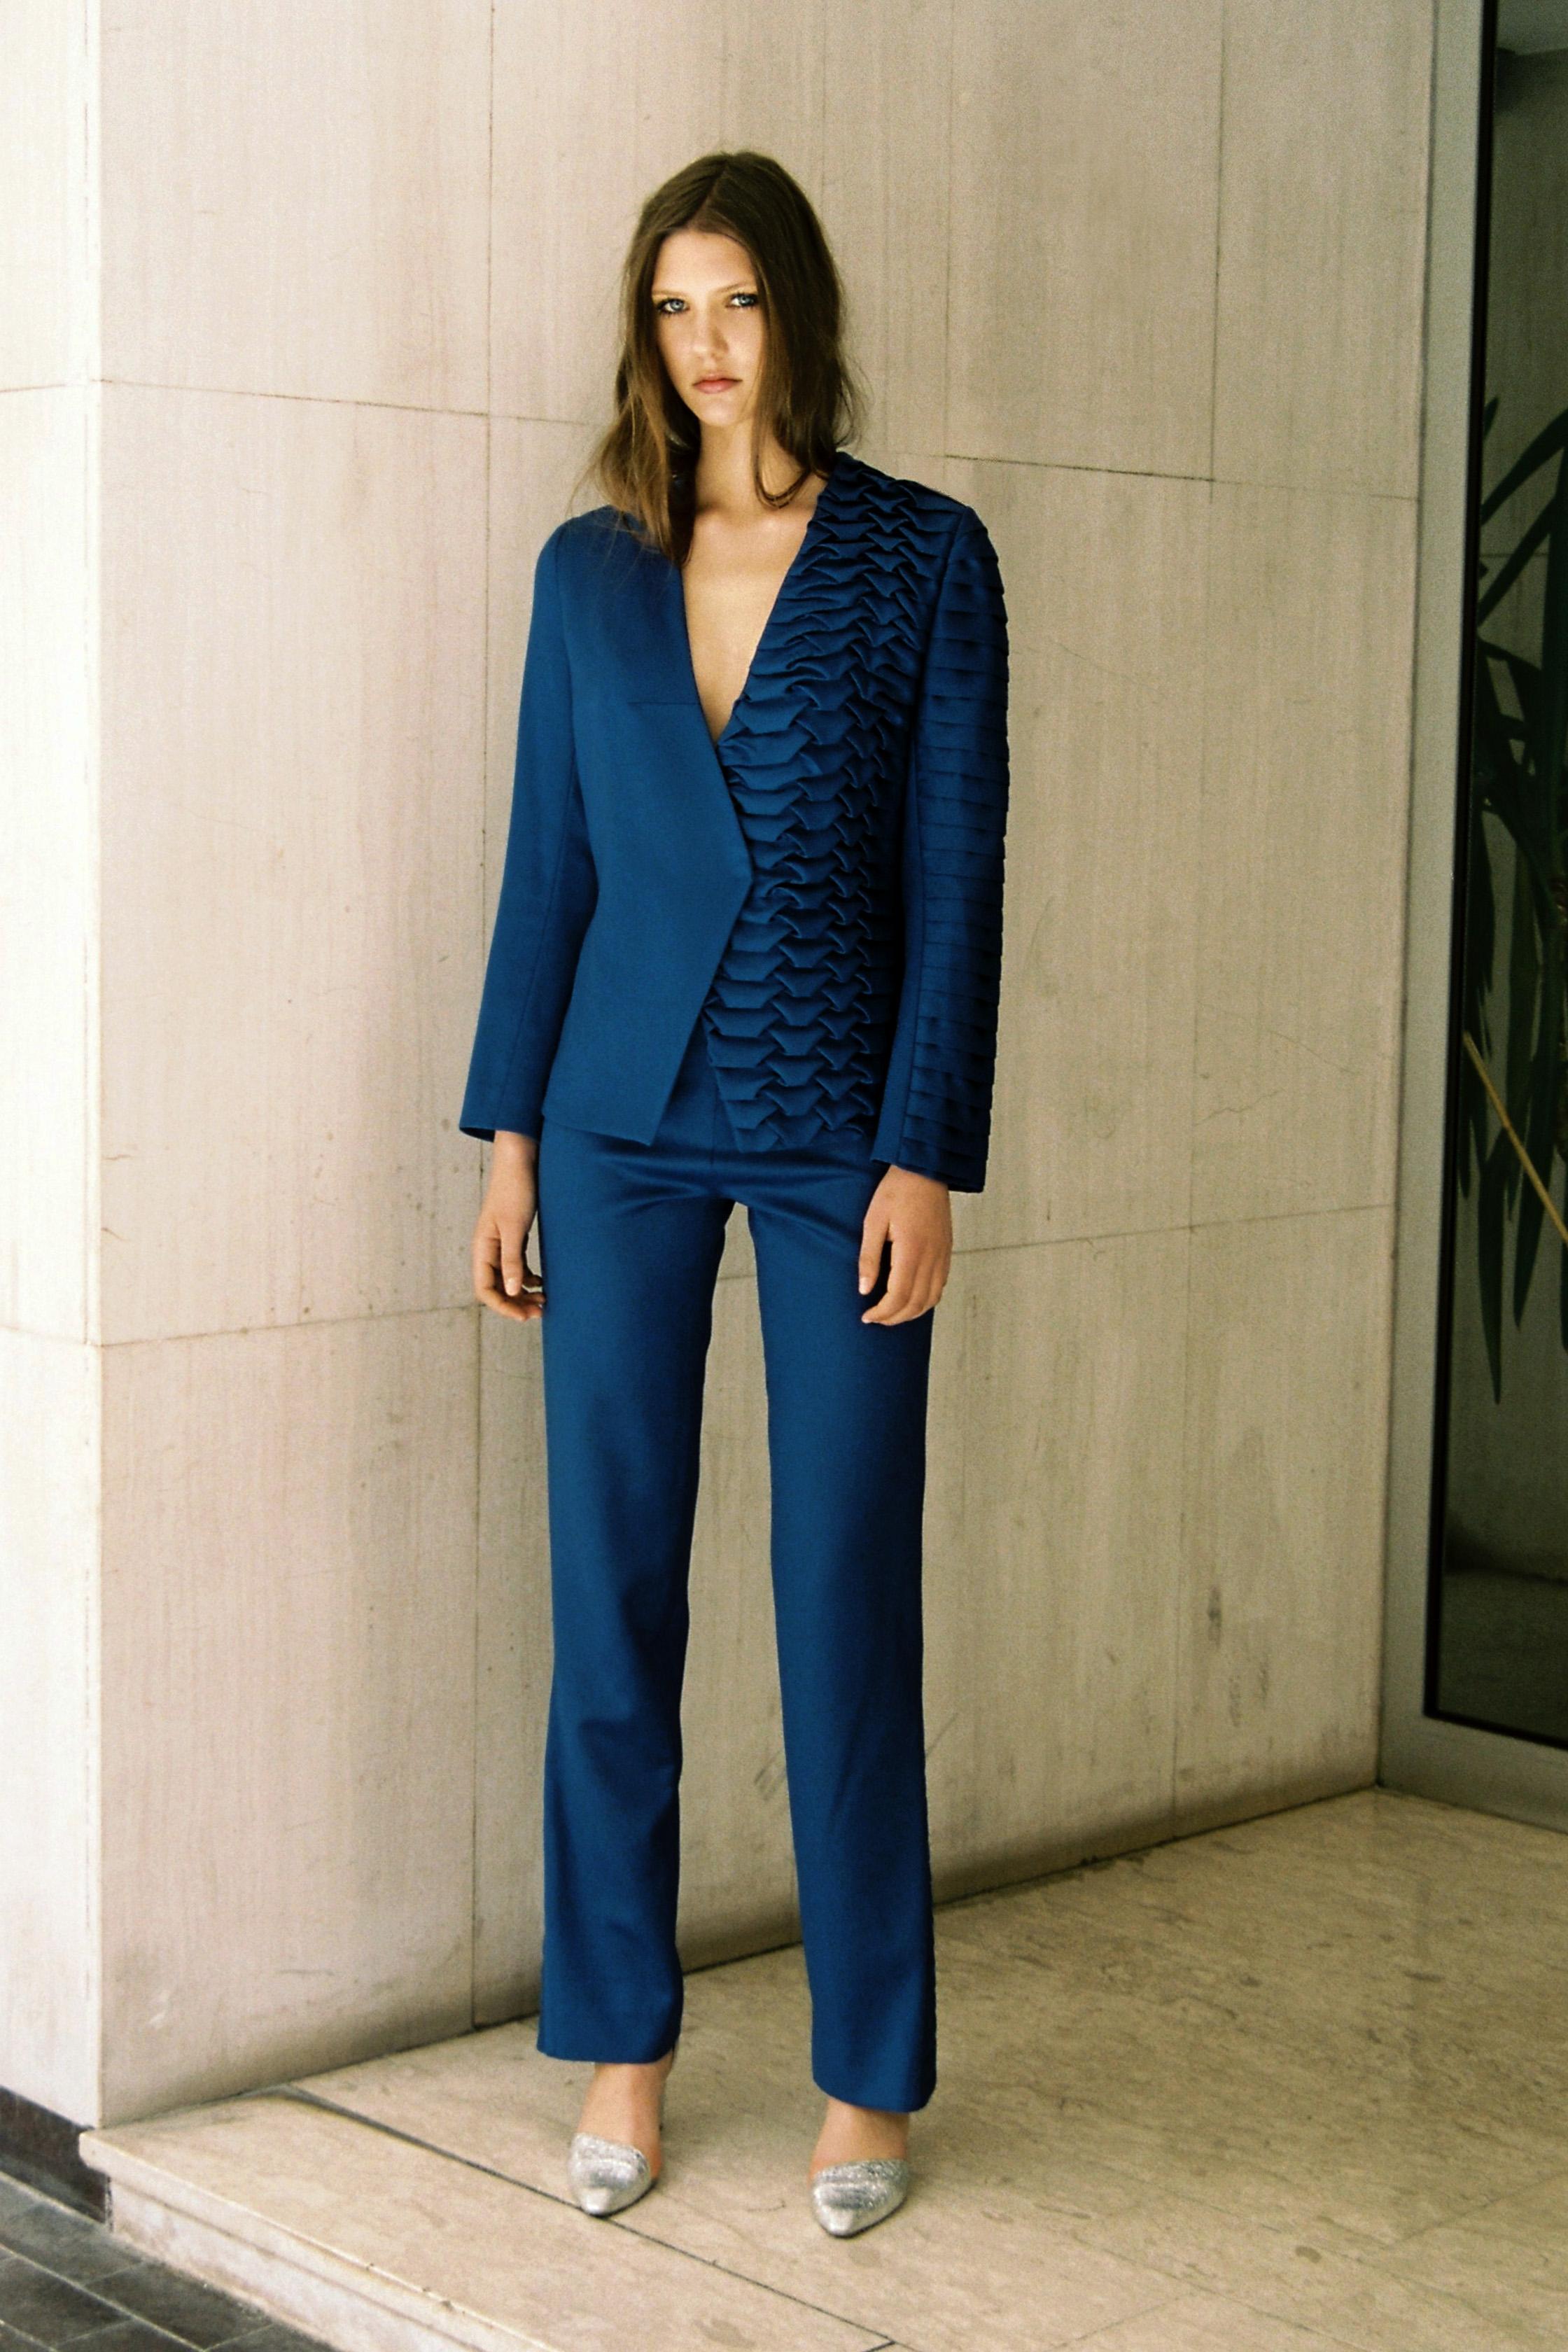 Suit / Jacket and Pants: Zorana Janjic  Shoes: J. Dileviciute